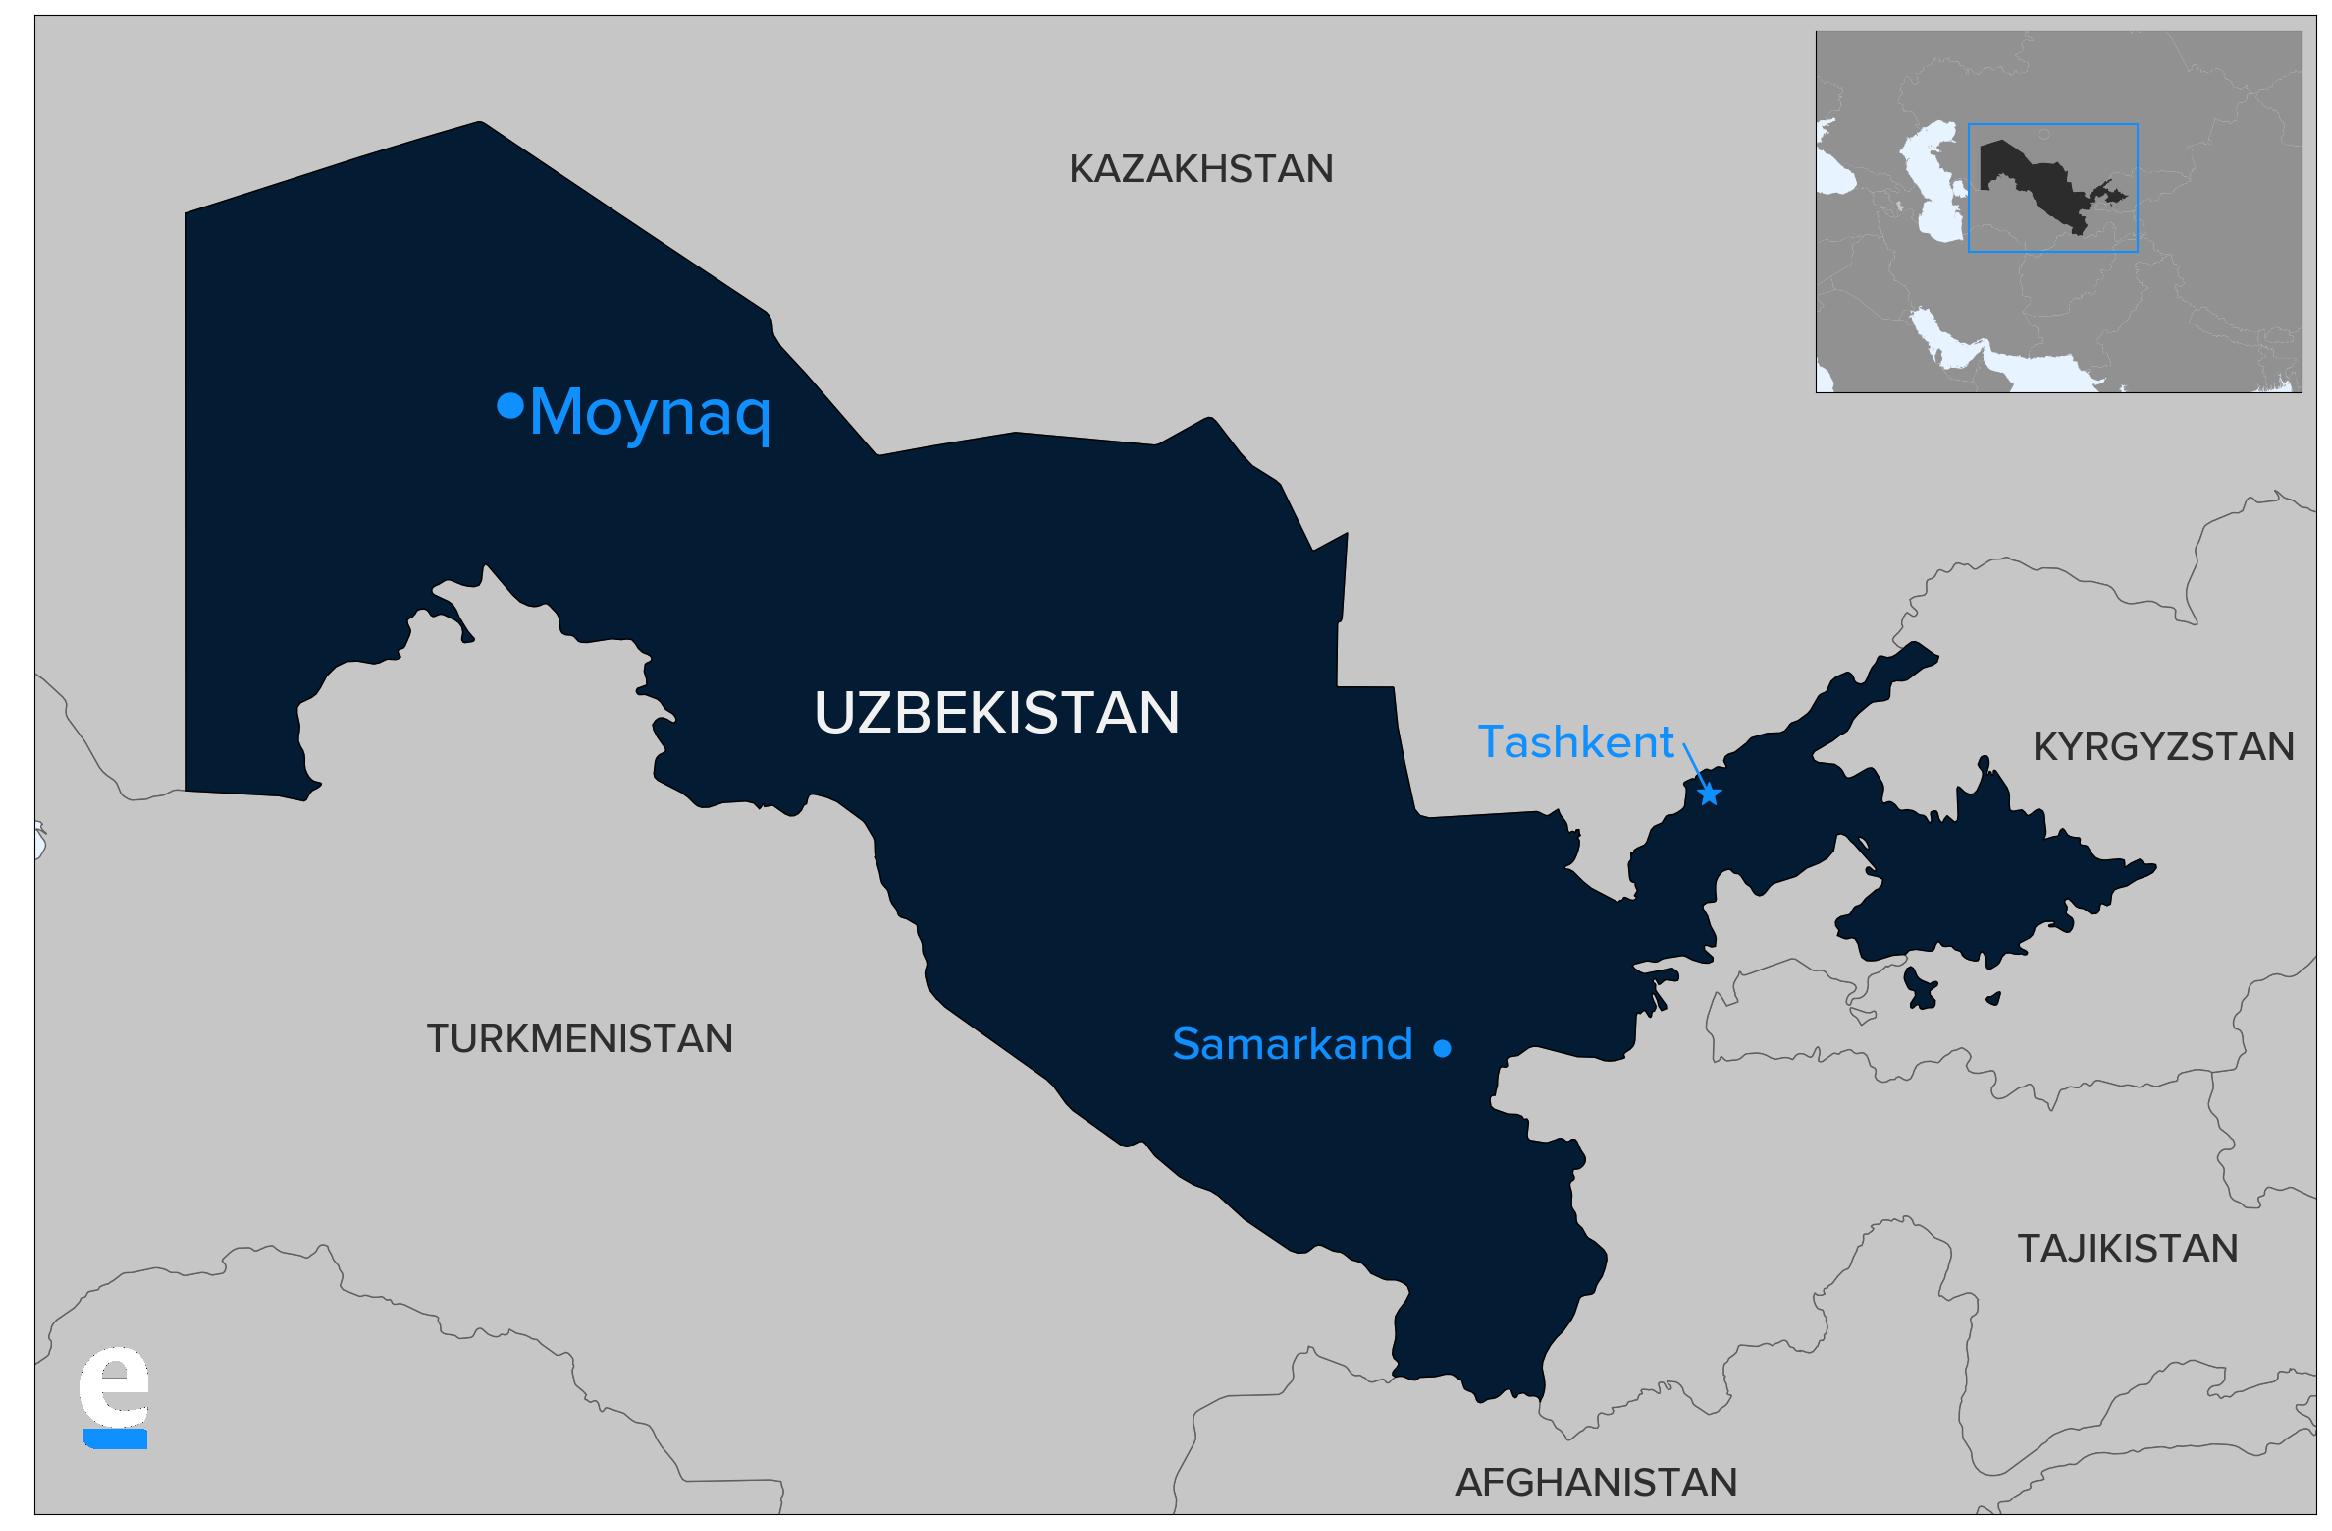 Moynaq map